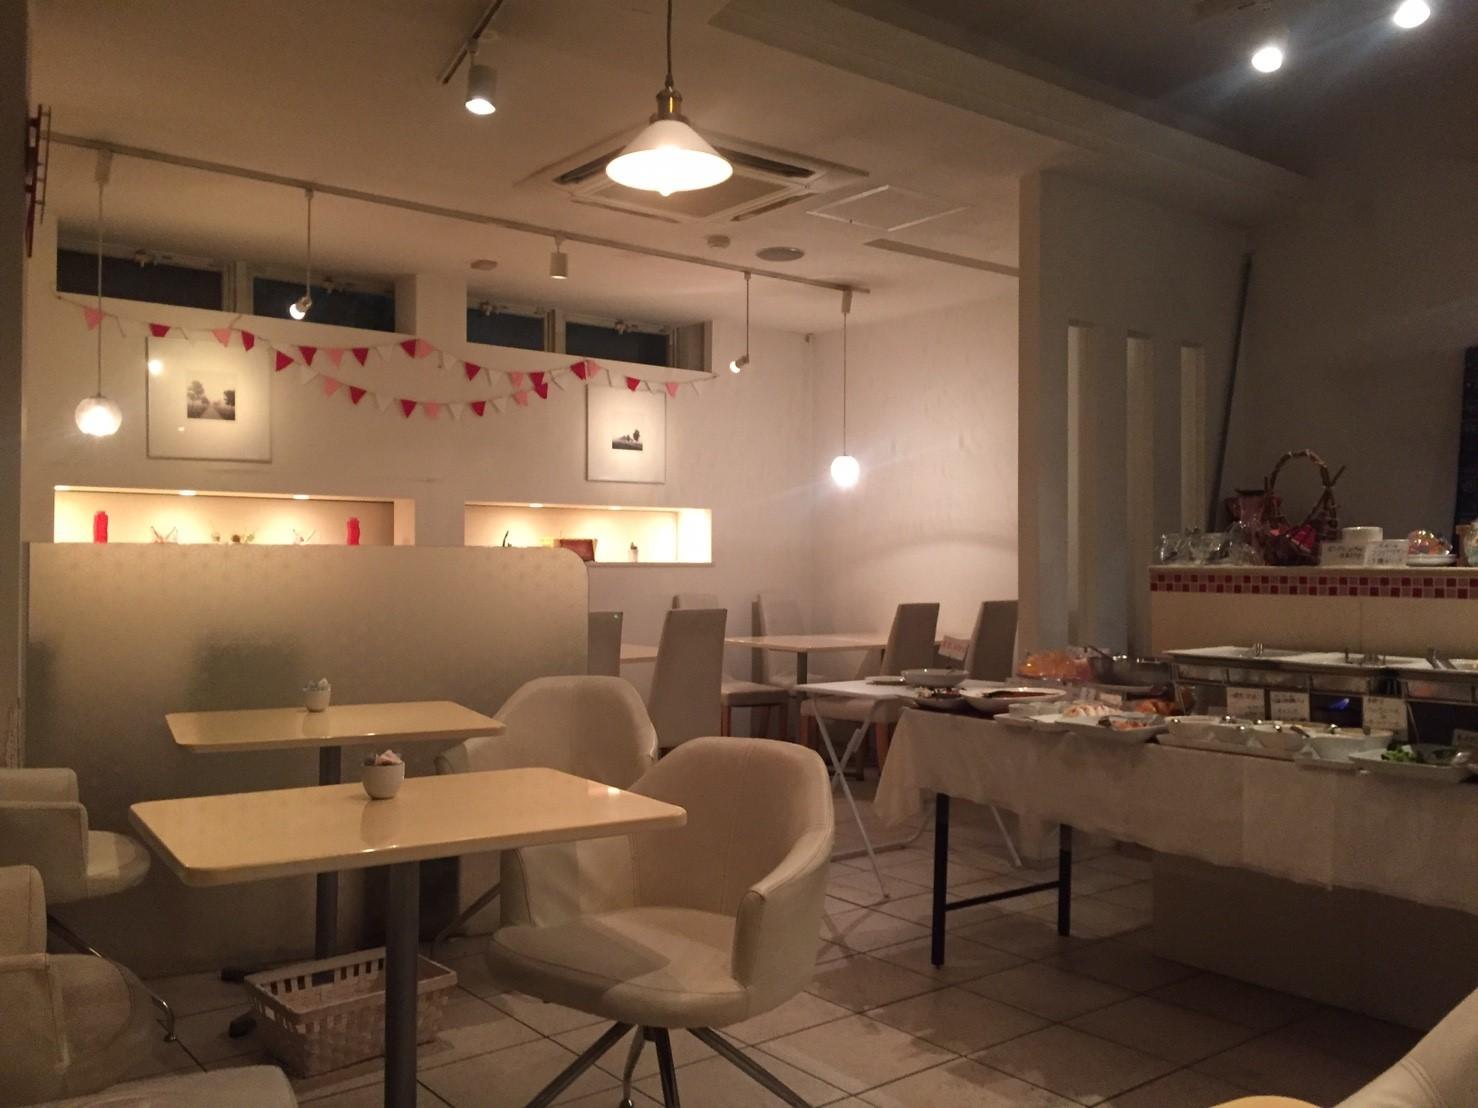 cafe coeur ディナービュッフェ_e0115904_02355863.jpg